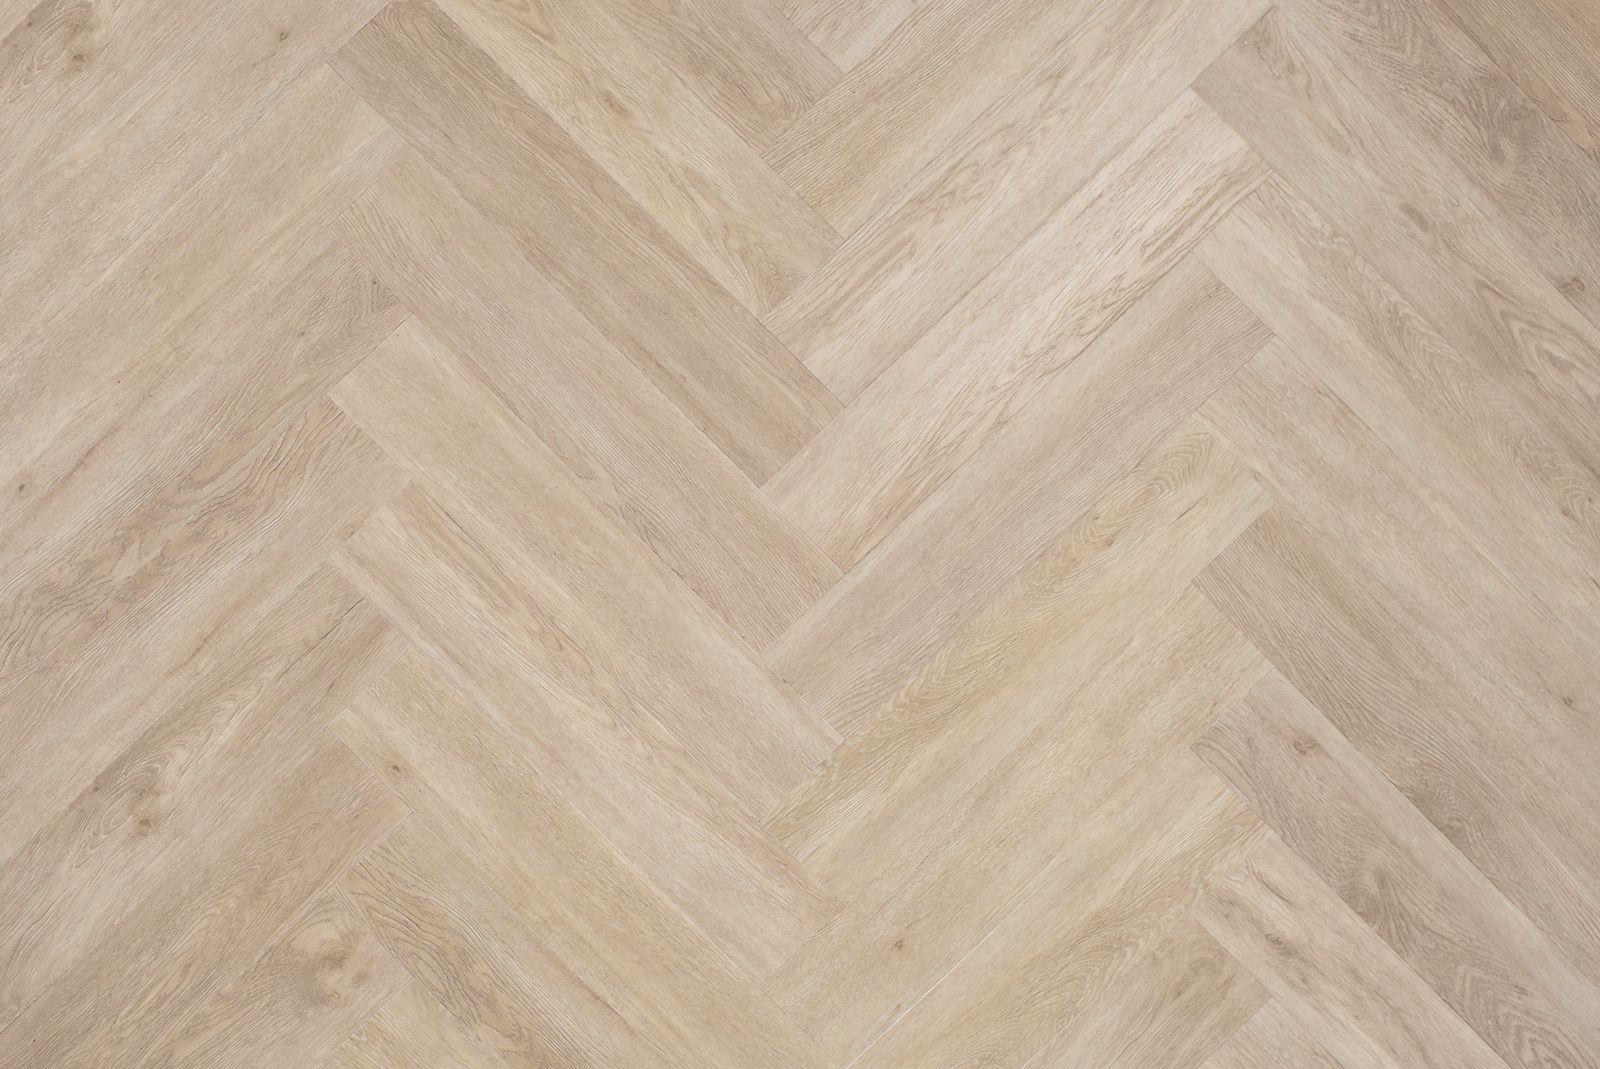 Pvc Vloeren Assen : Visgraat pvc vloeren kunststof patroon mflor floer parva plus